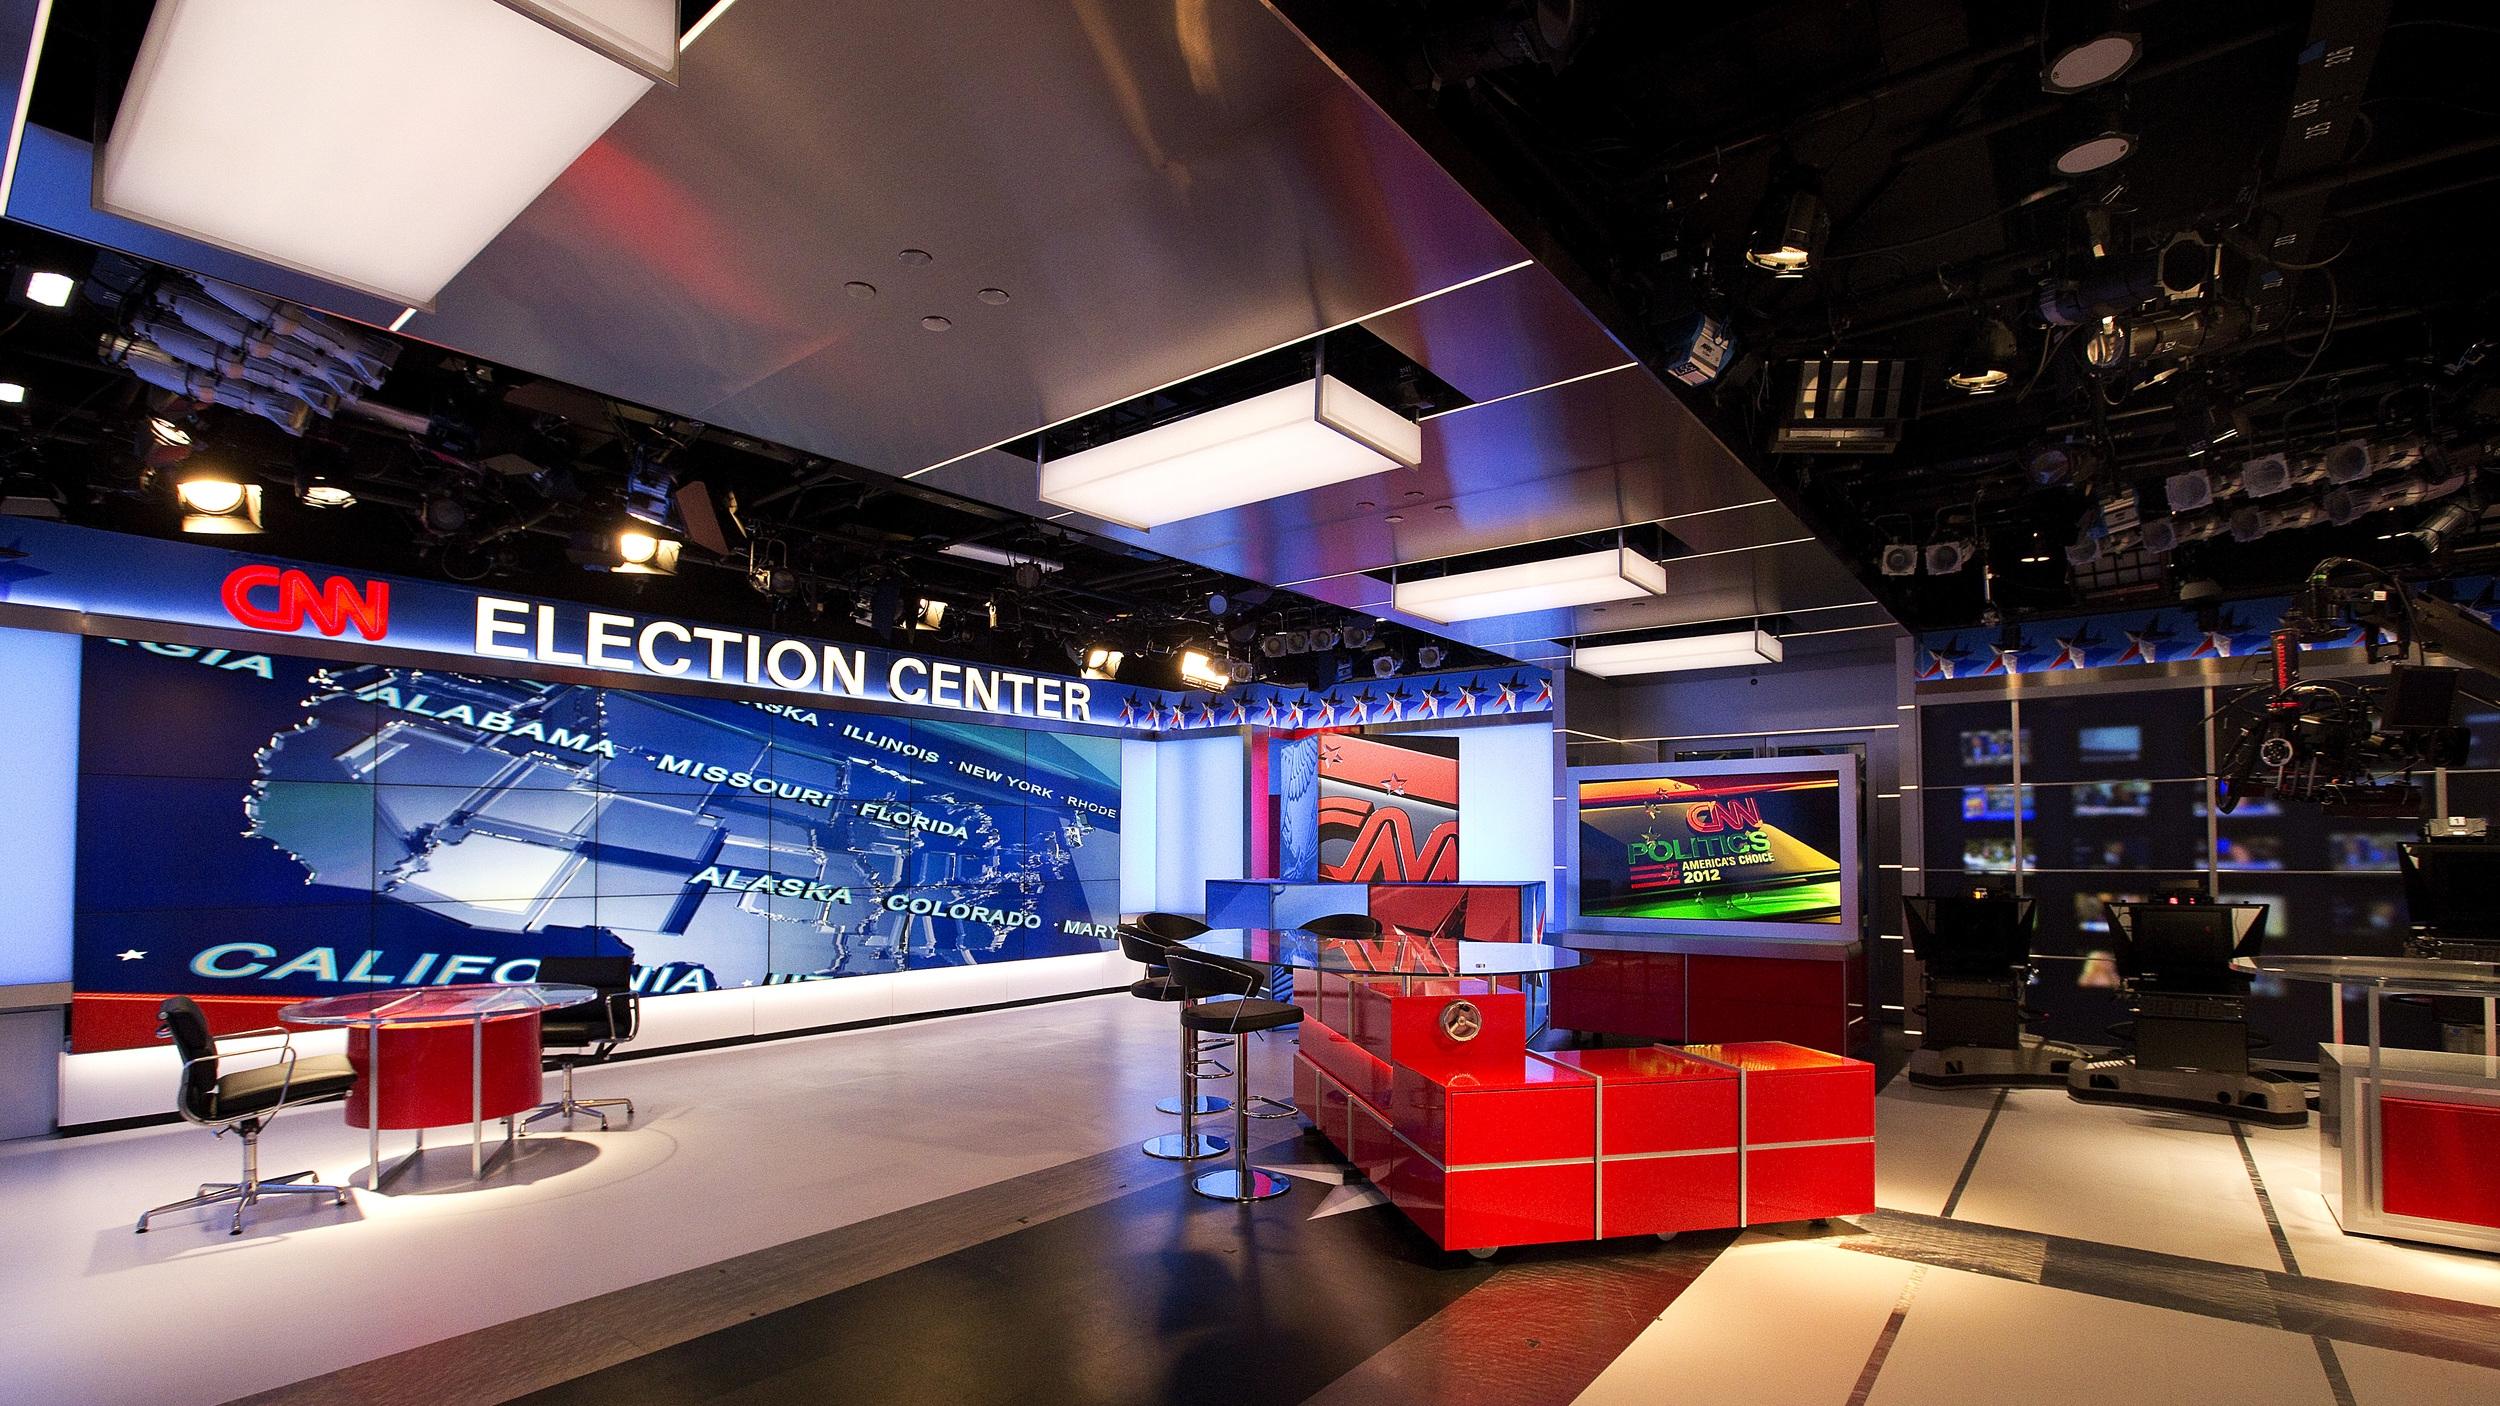 cnn_wdc_election_center10.JPG